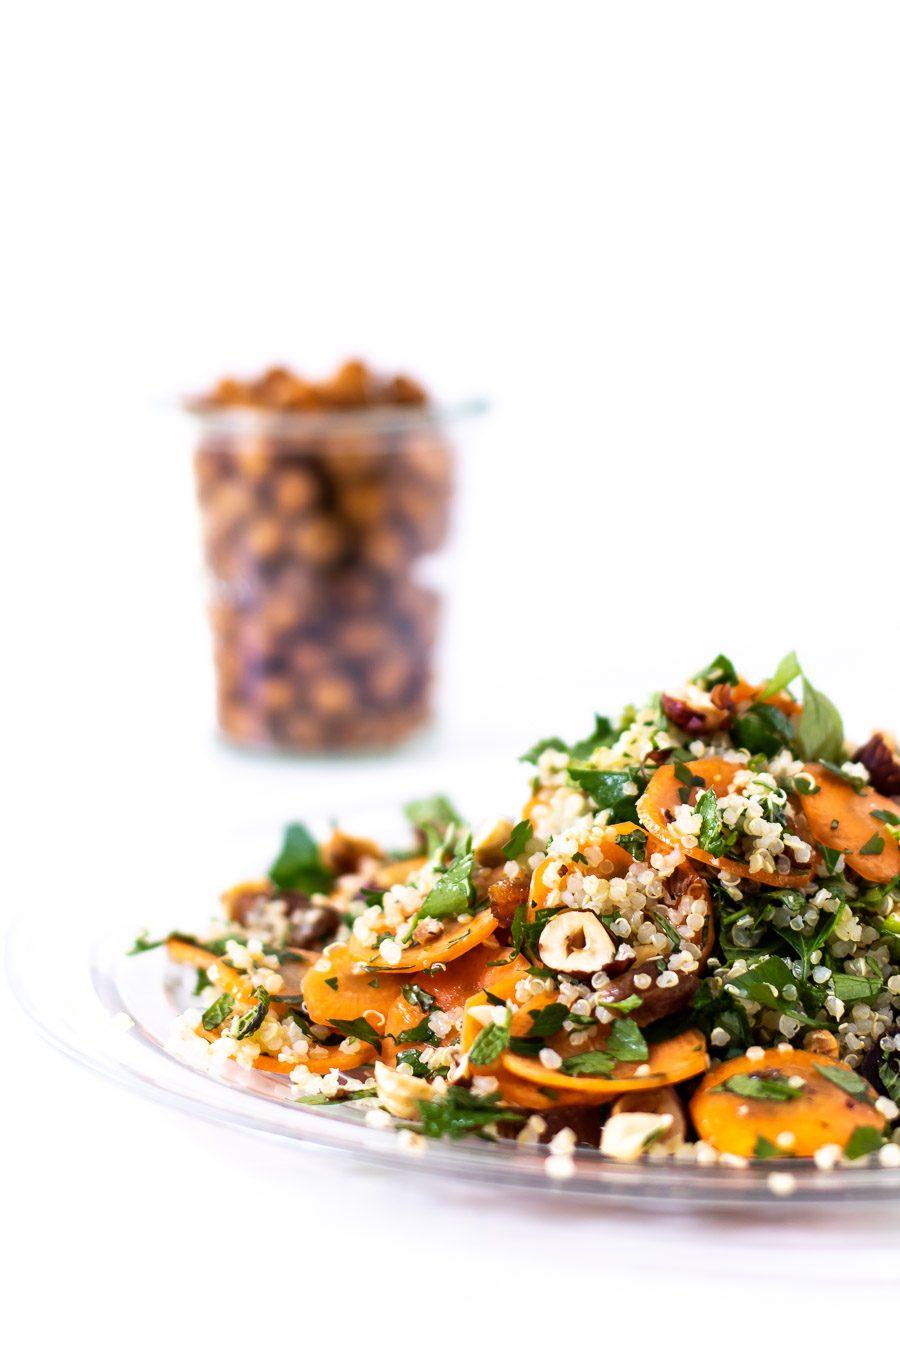 Nem quinoasalat med gulerod, abrikos og krydderurter